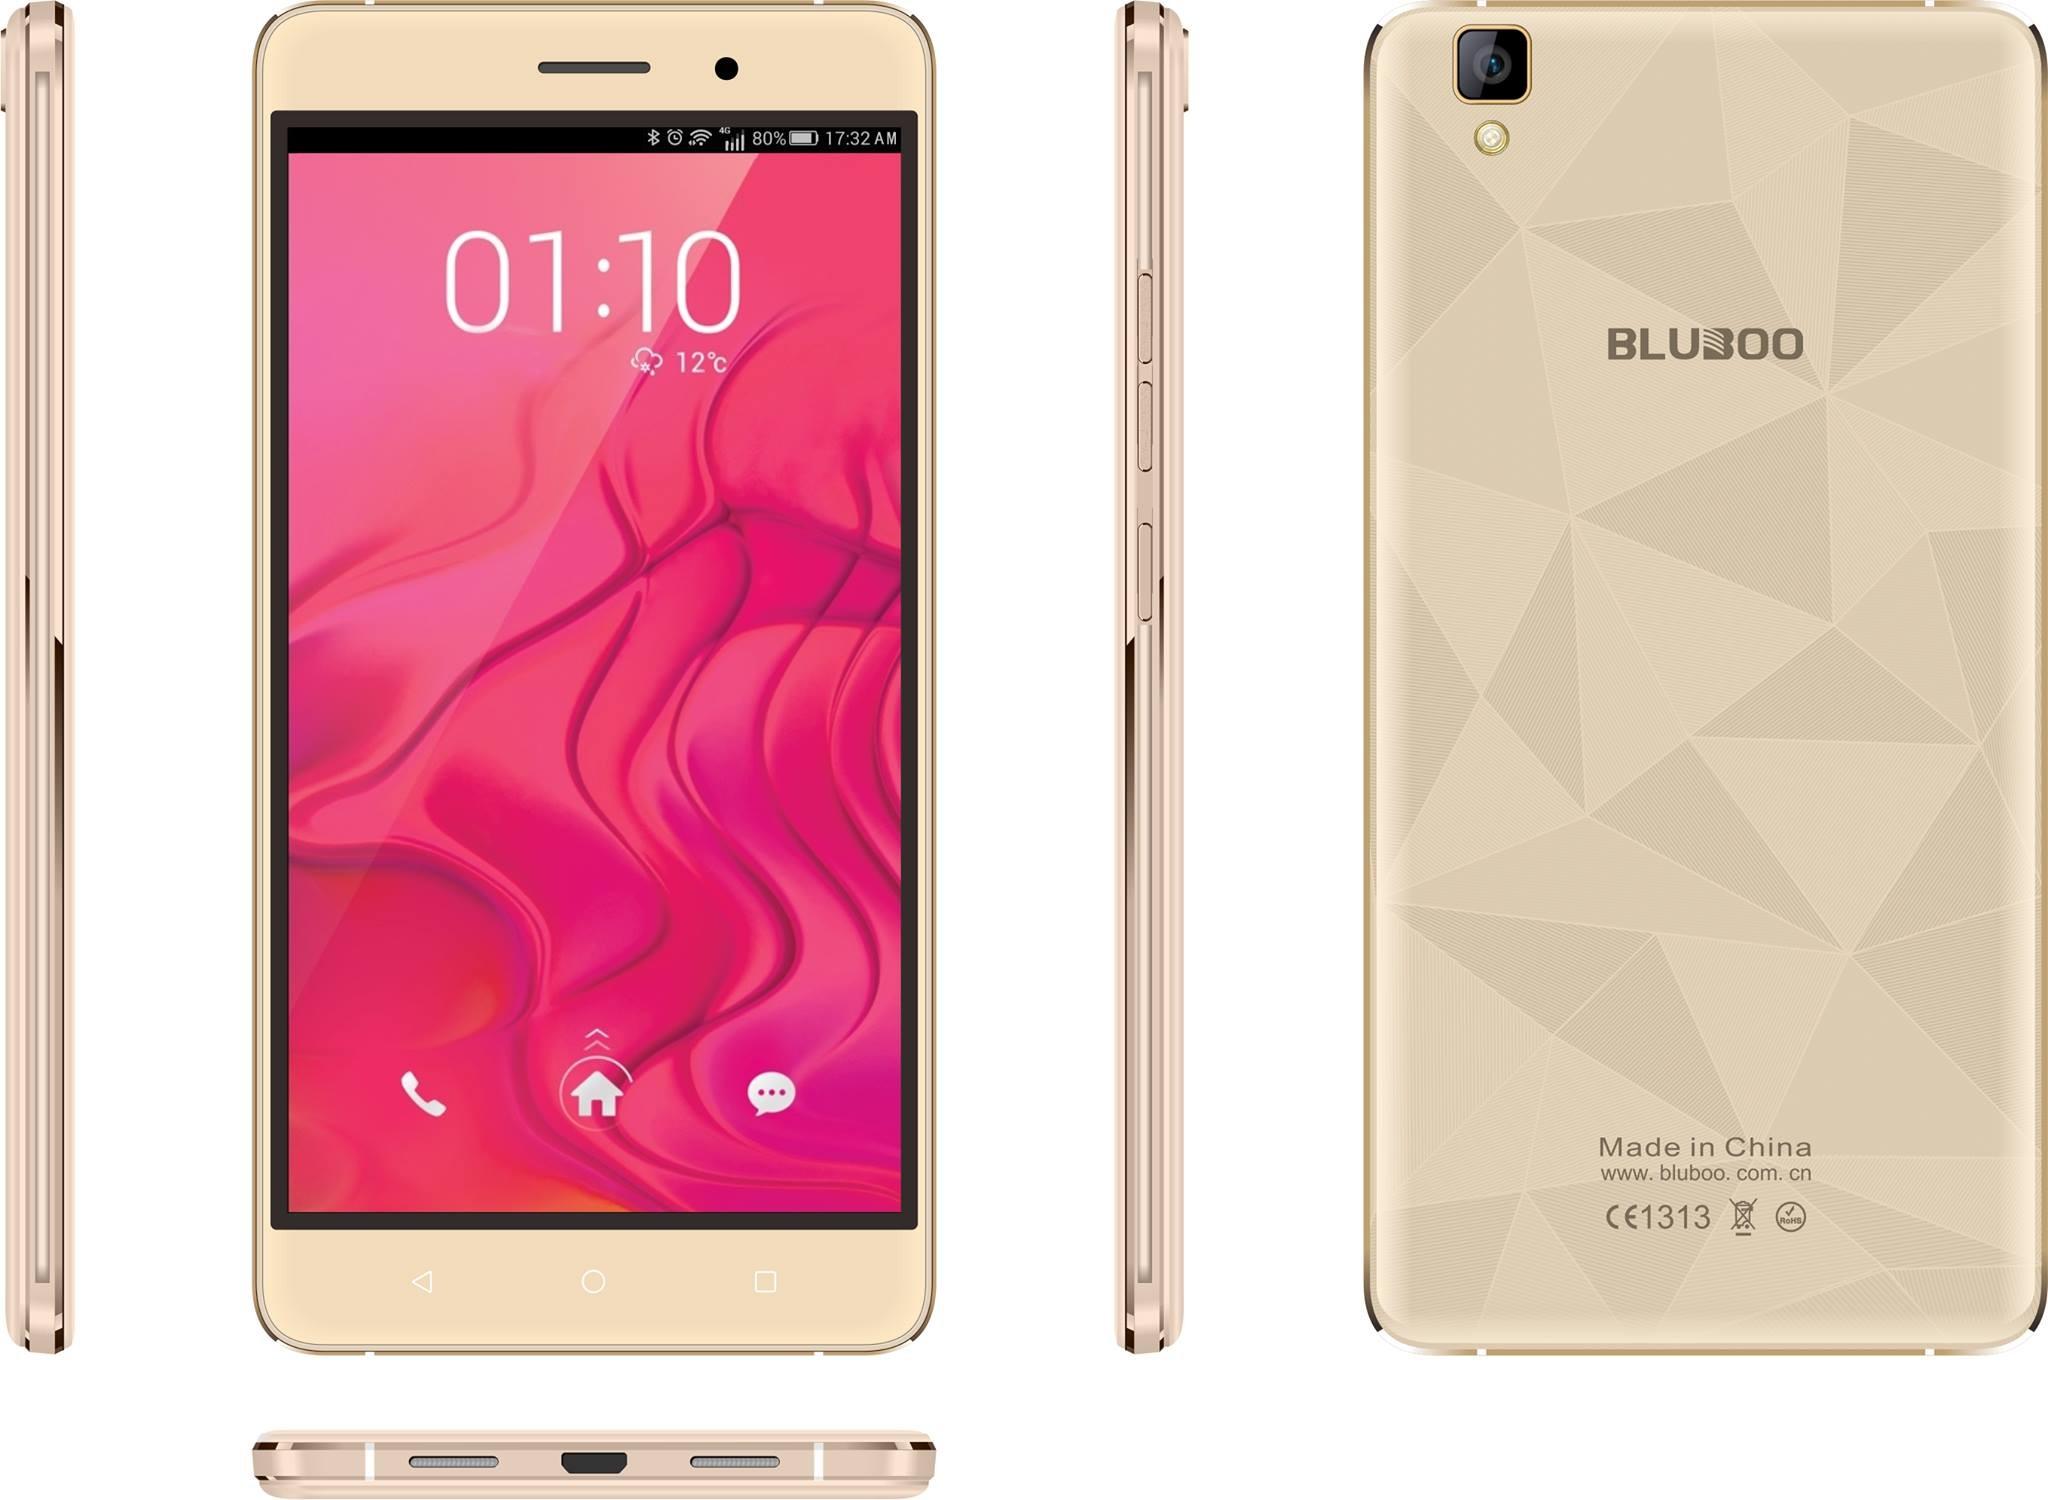 Bluboo готовит квыходу новый смартфон R1